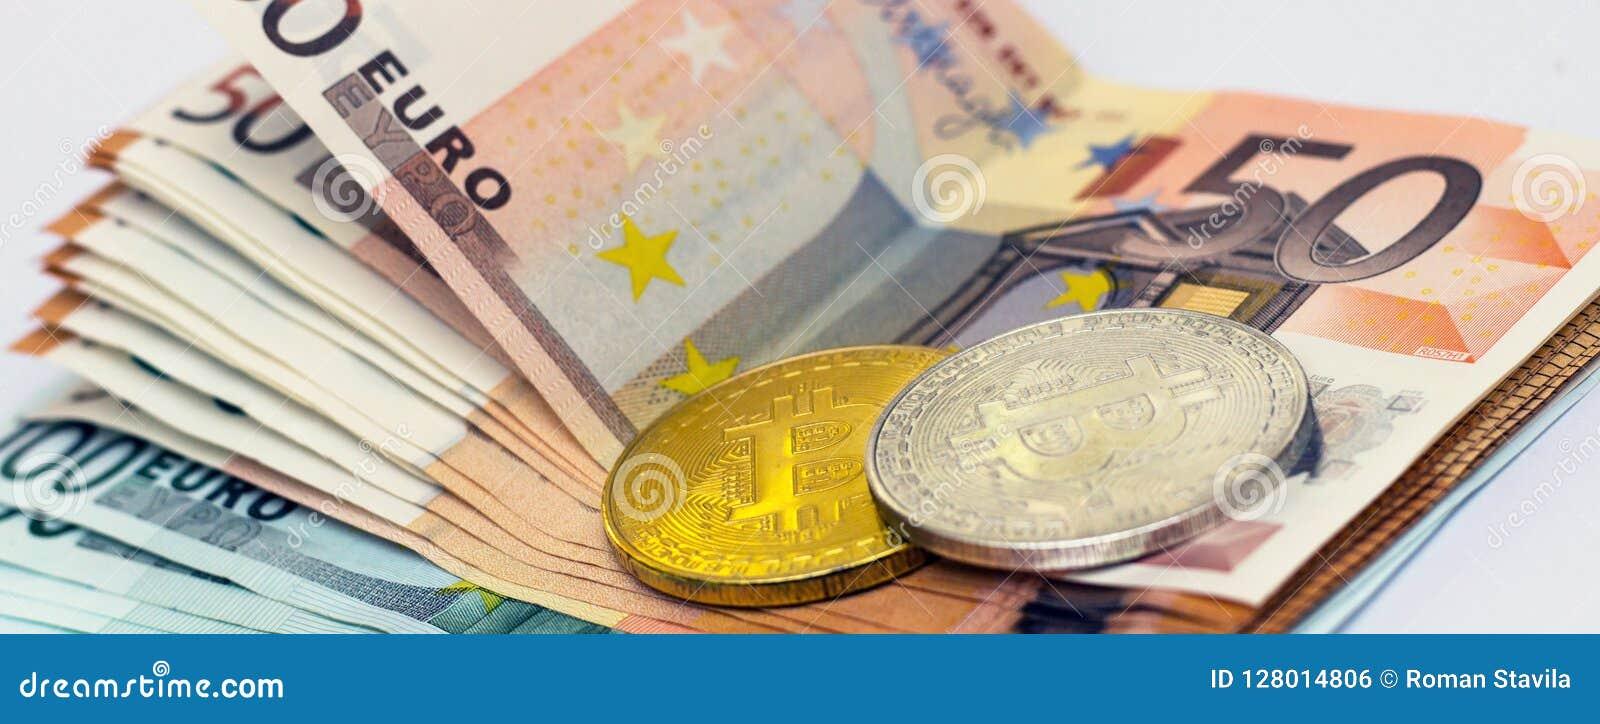 100 euros to bitcoins worth sports betting vegas mgm properties